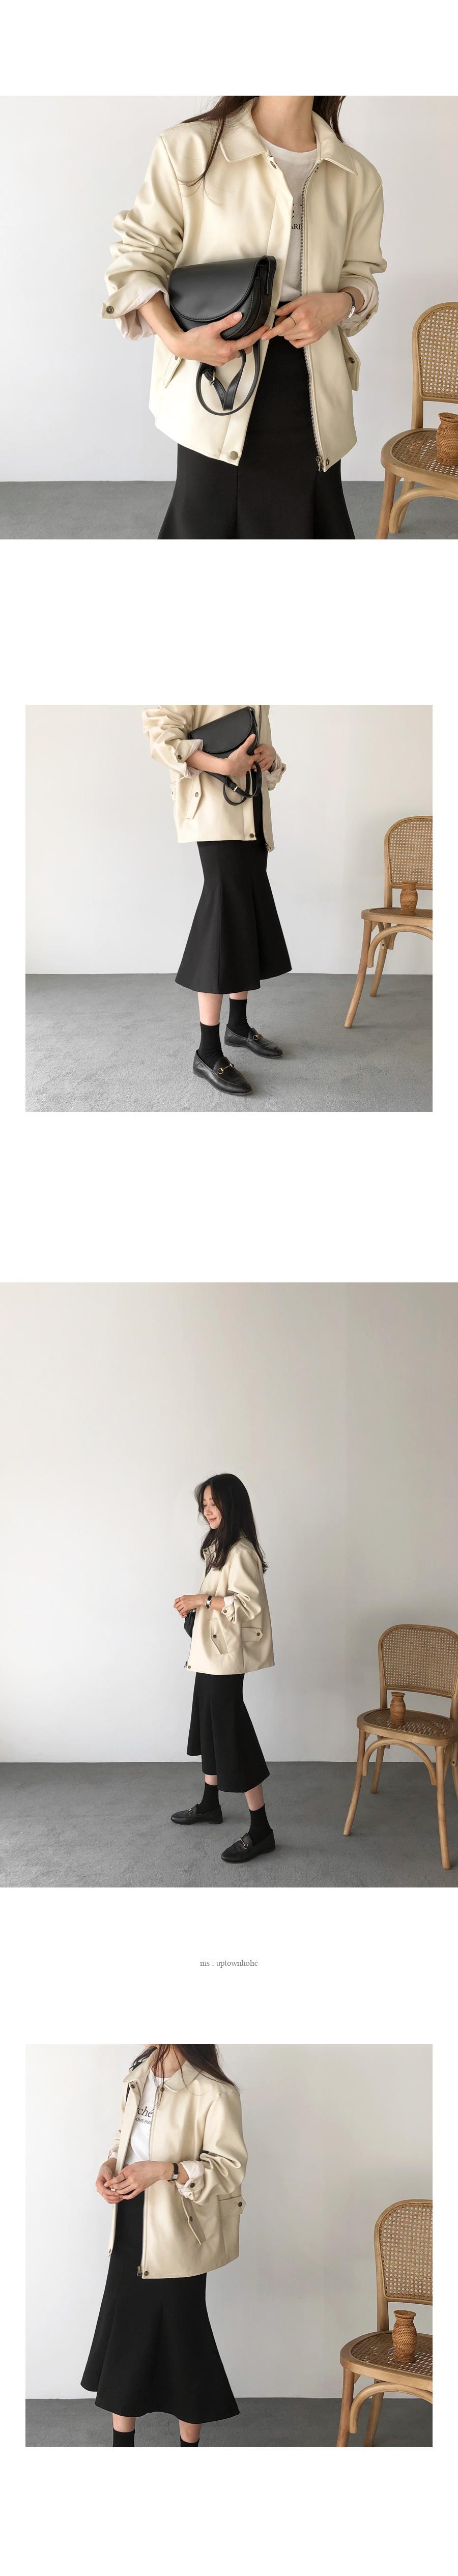 Leather Jackets jk Ivory